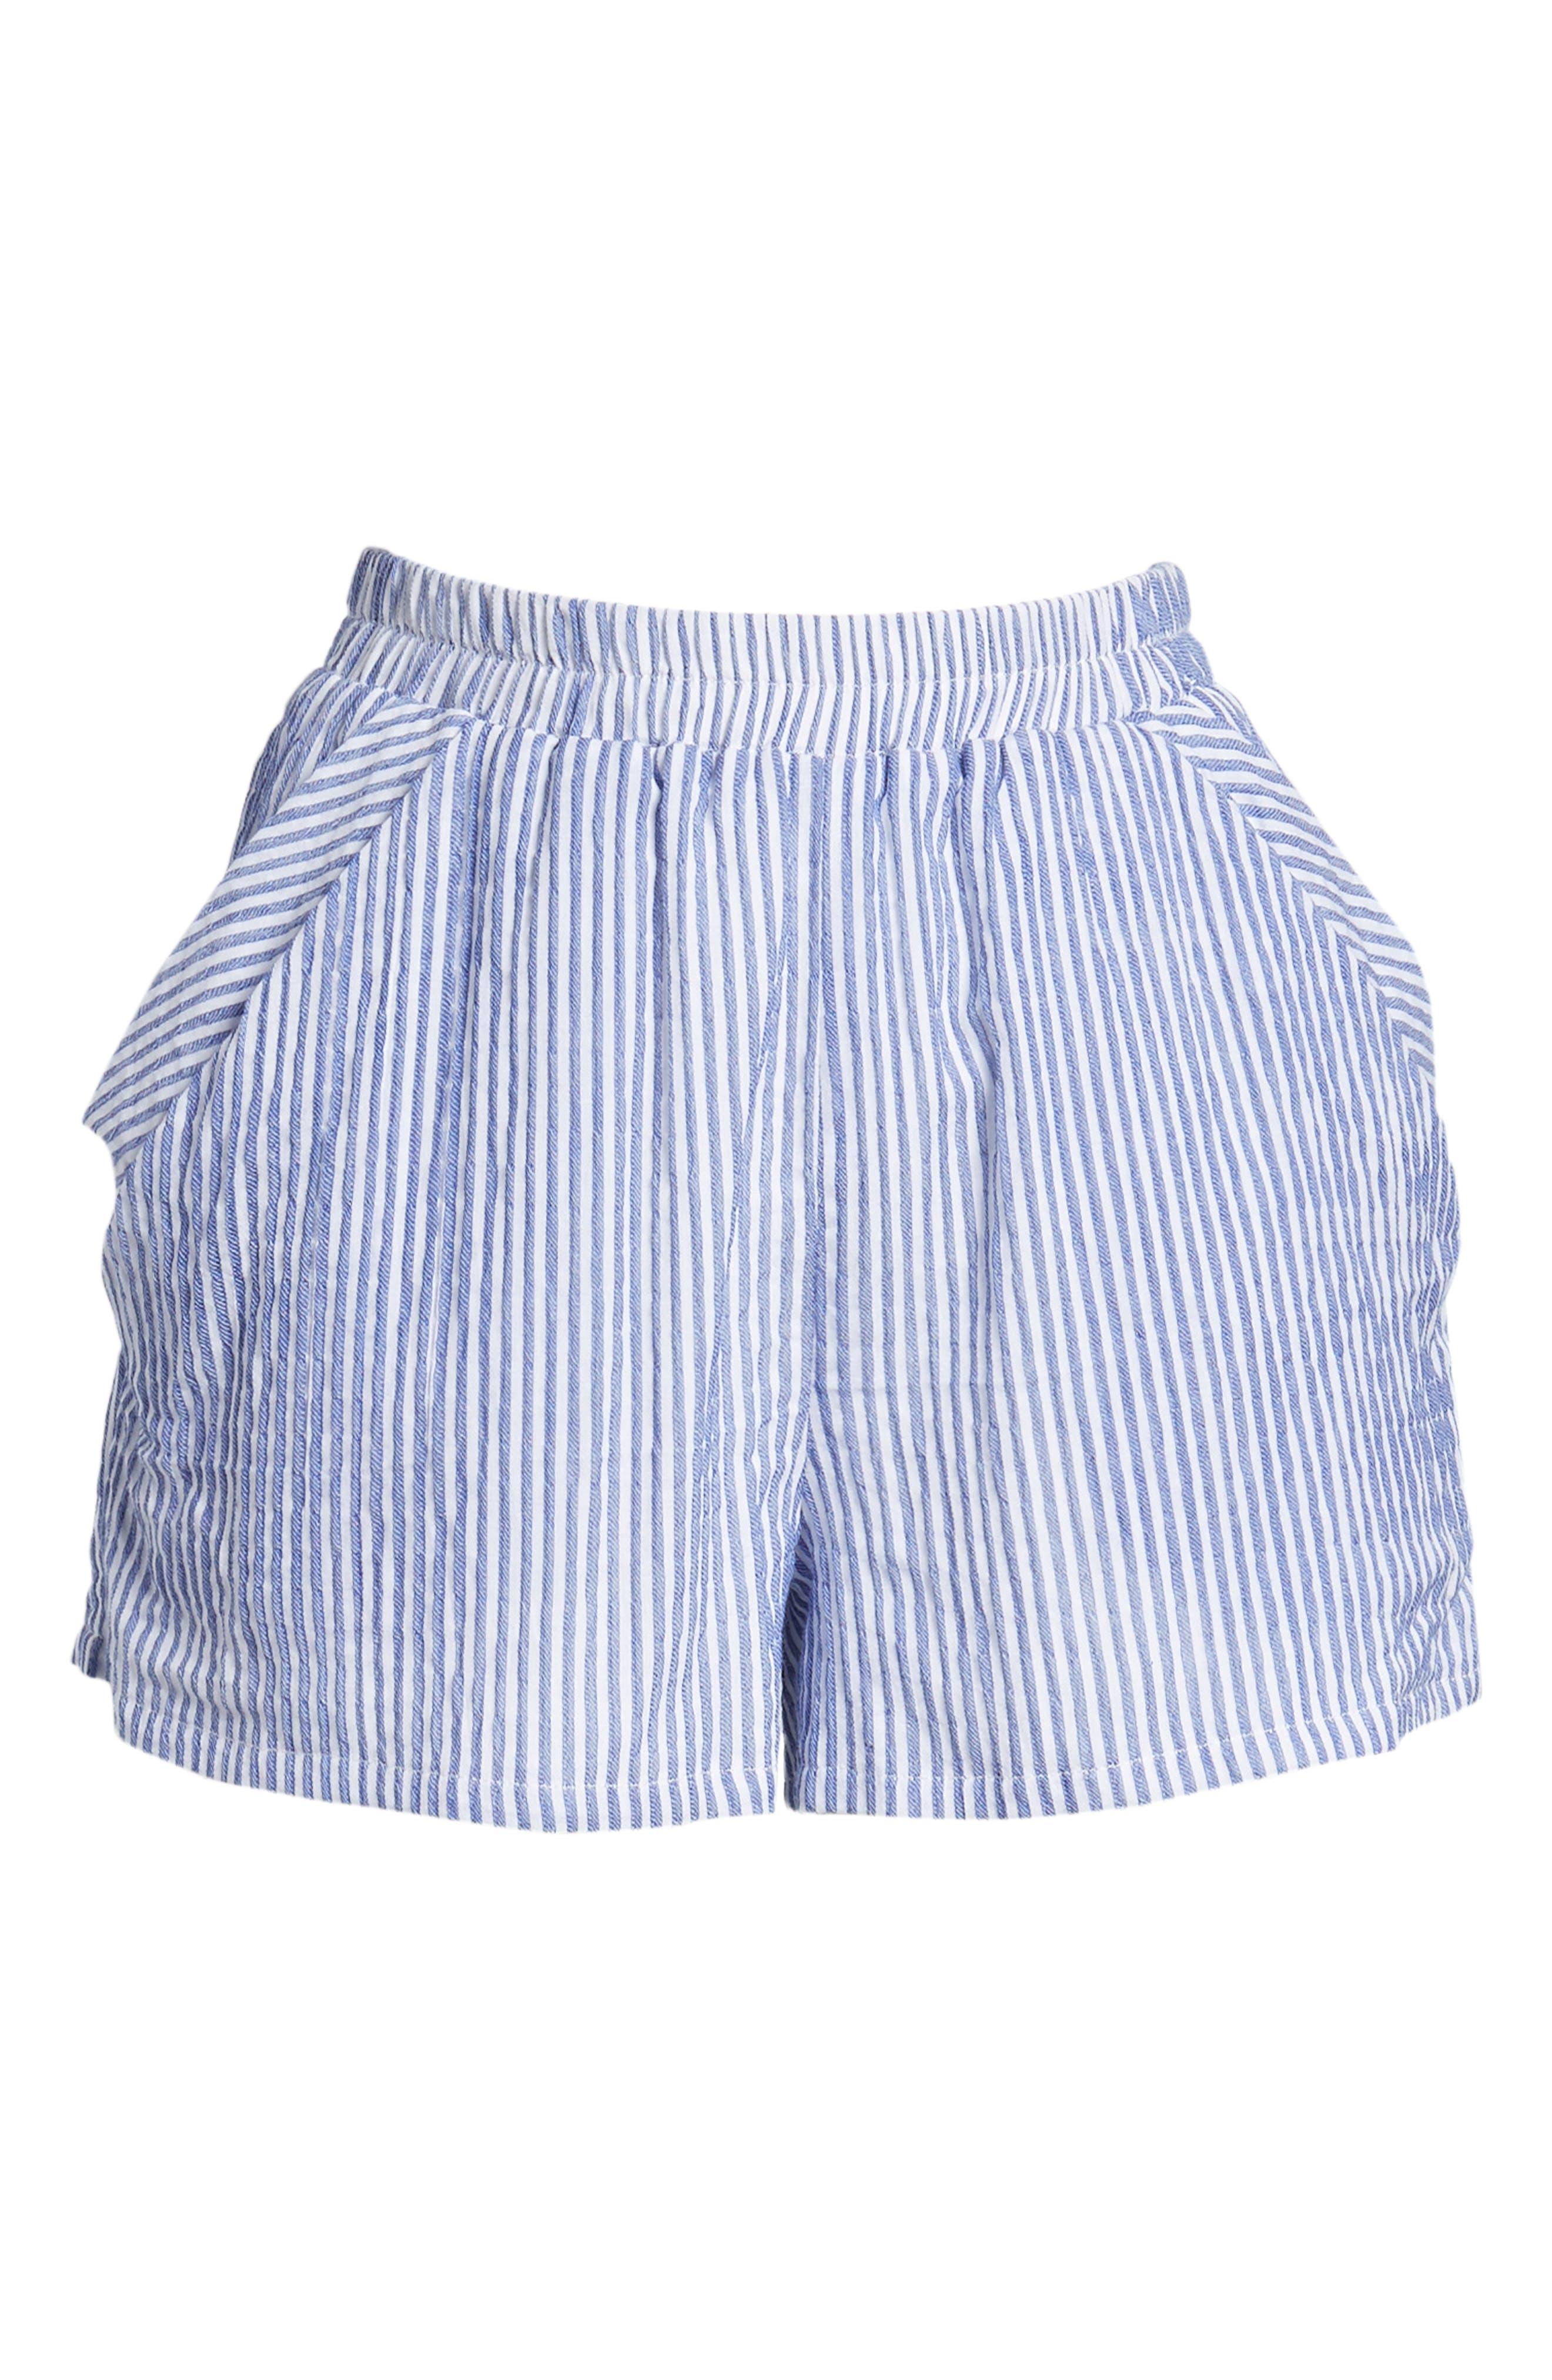 BISHOP + YOUNG,                             Stripe Shorts,                             Alternate thumbnail 6, color,                             400